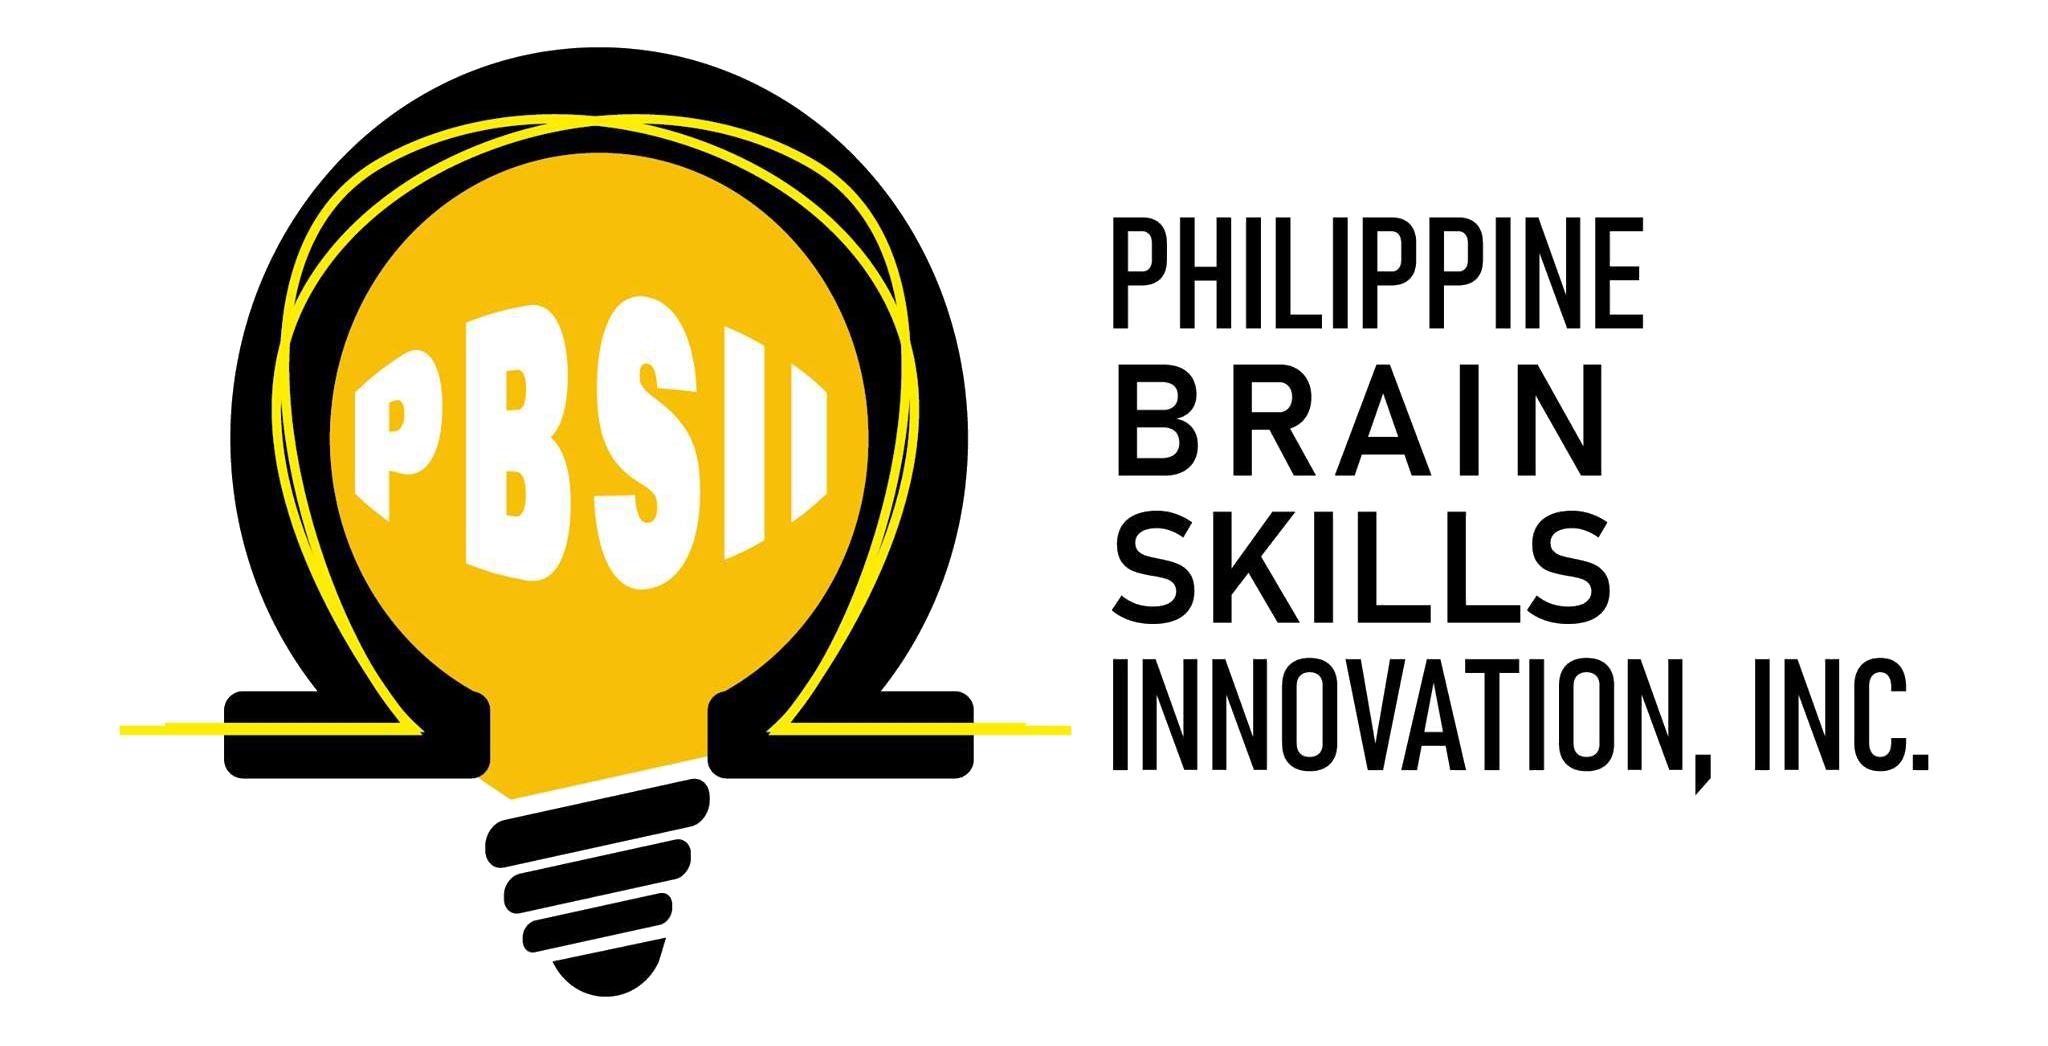 Philippine Brain Skills Innovation Group Inc. Logo